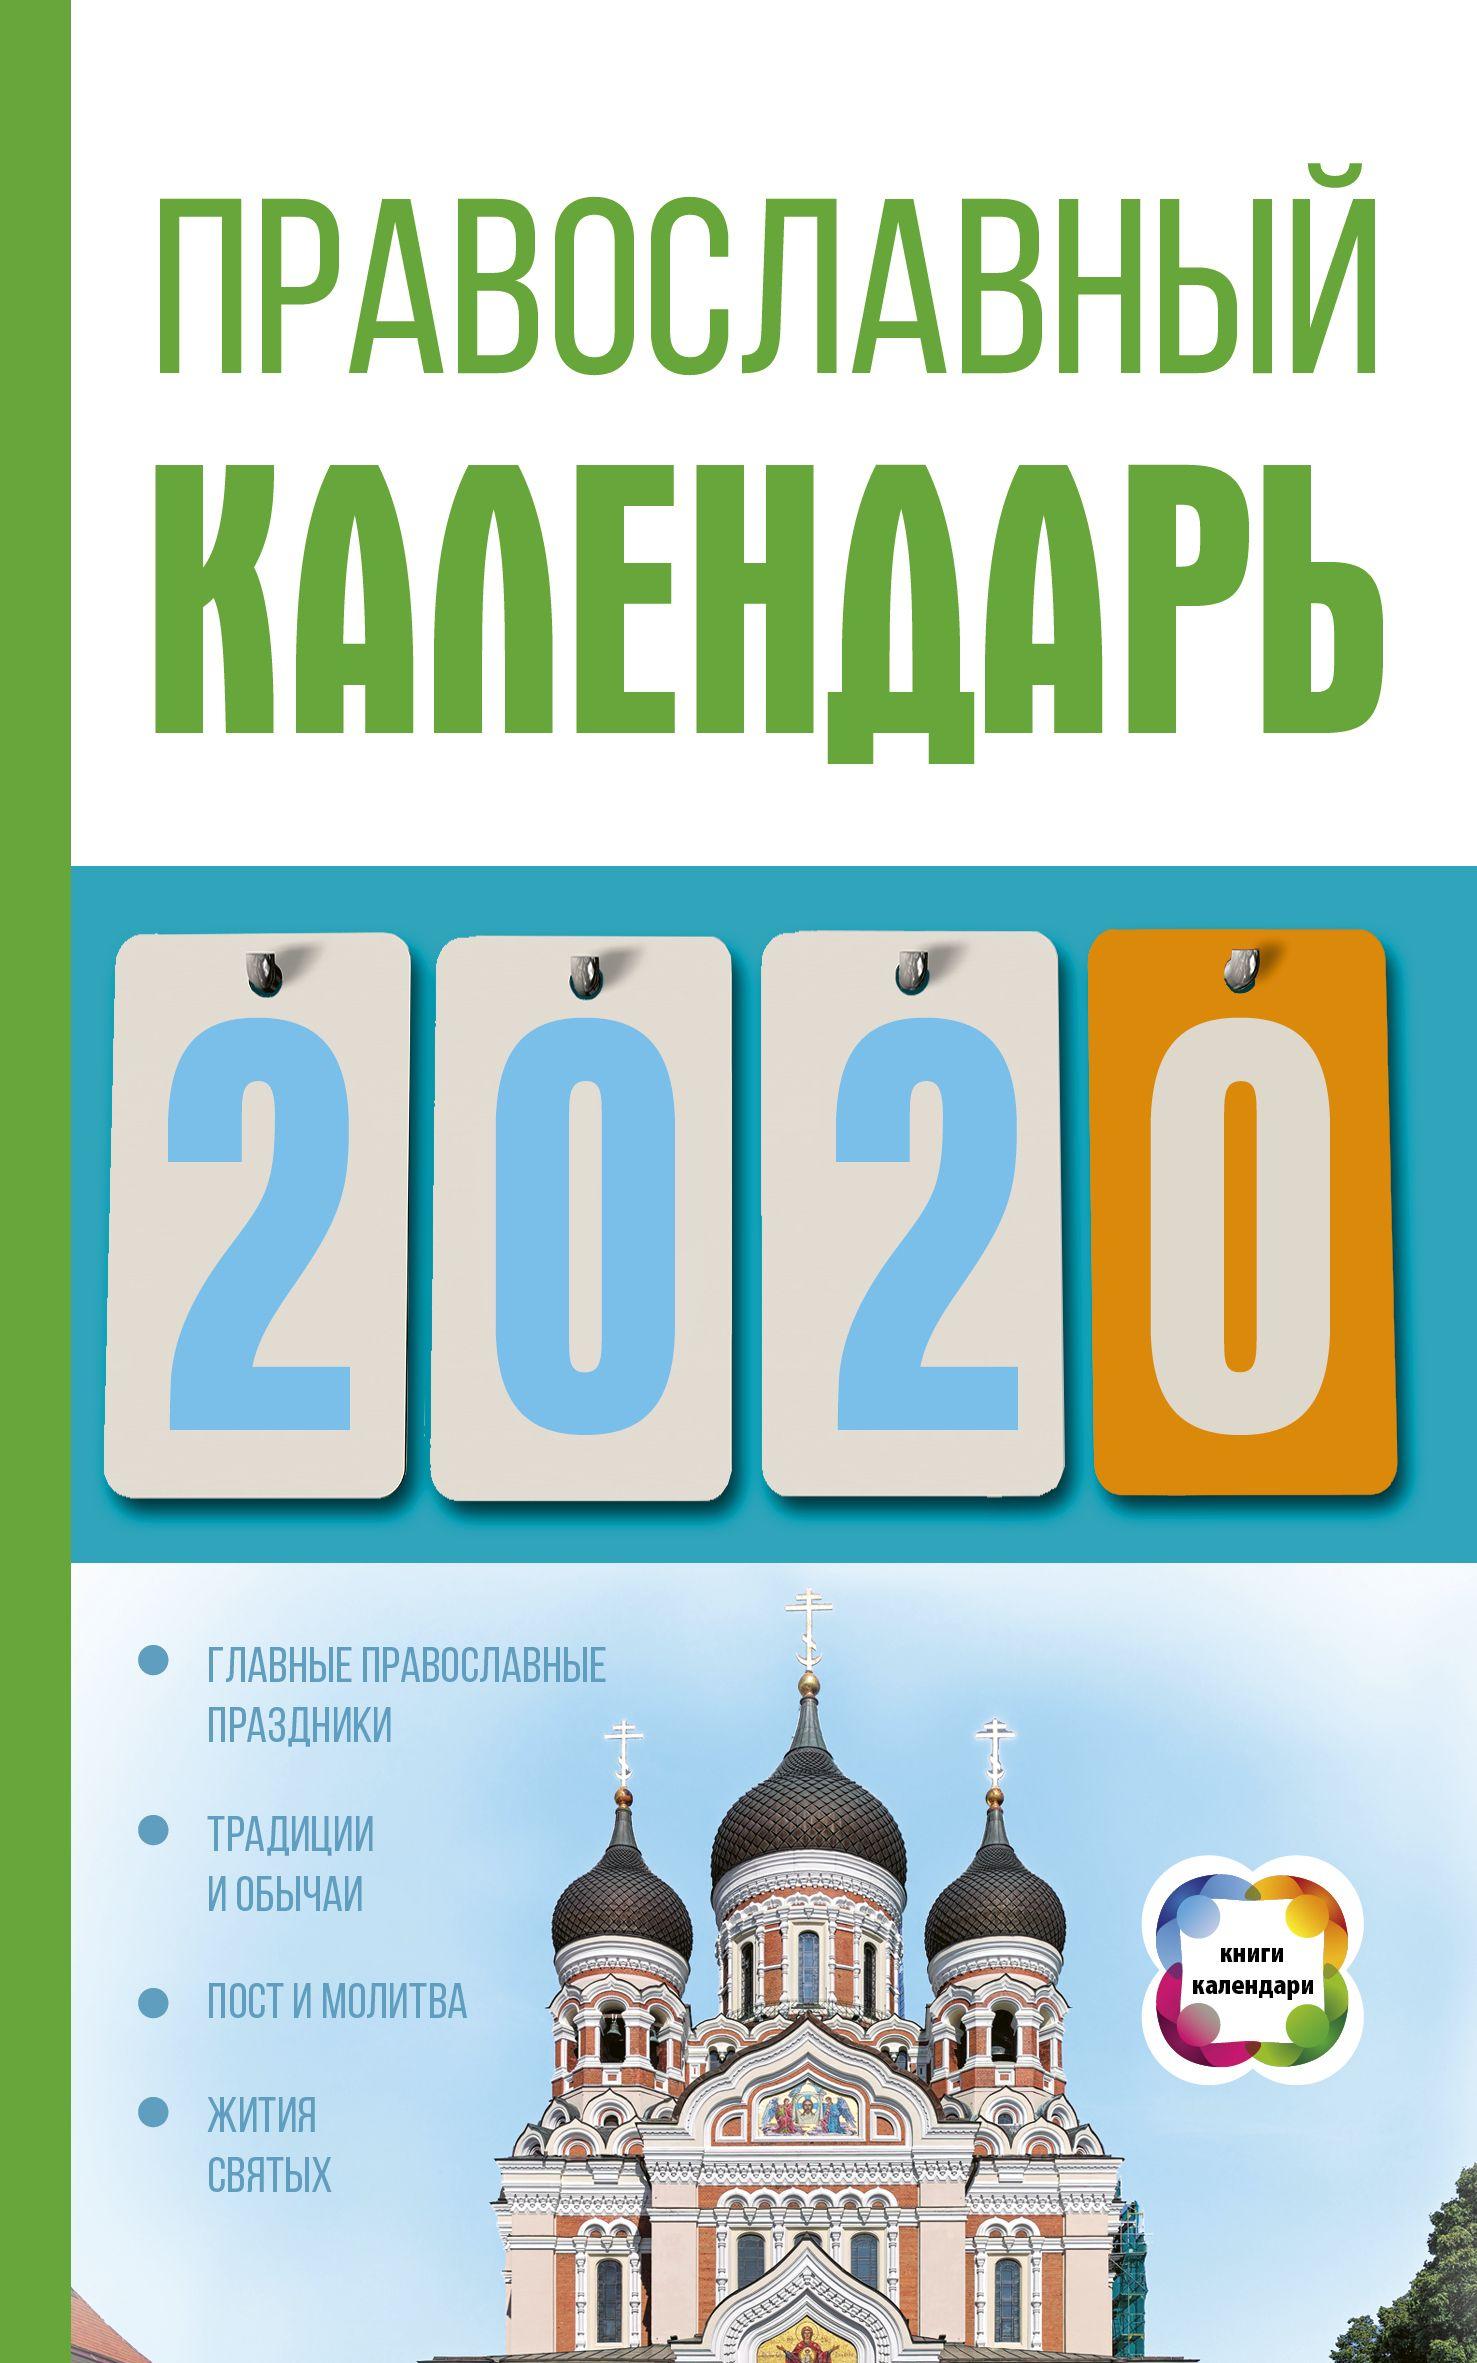 Диана Хорсанд-Мавроматис Православный календарь на 2020 год калинина м календарь православных праздников на 2016 год